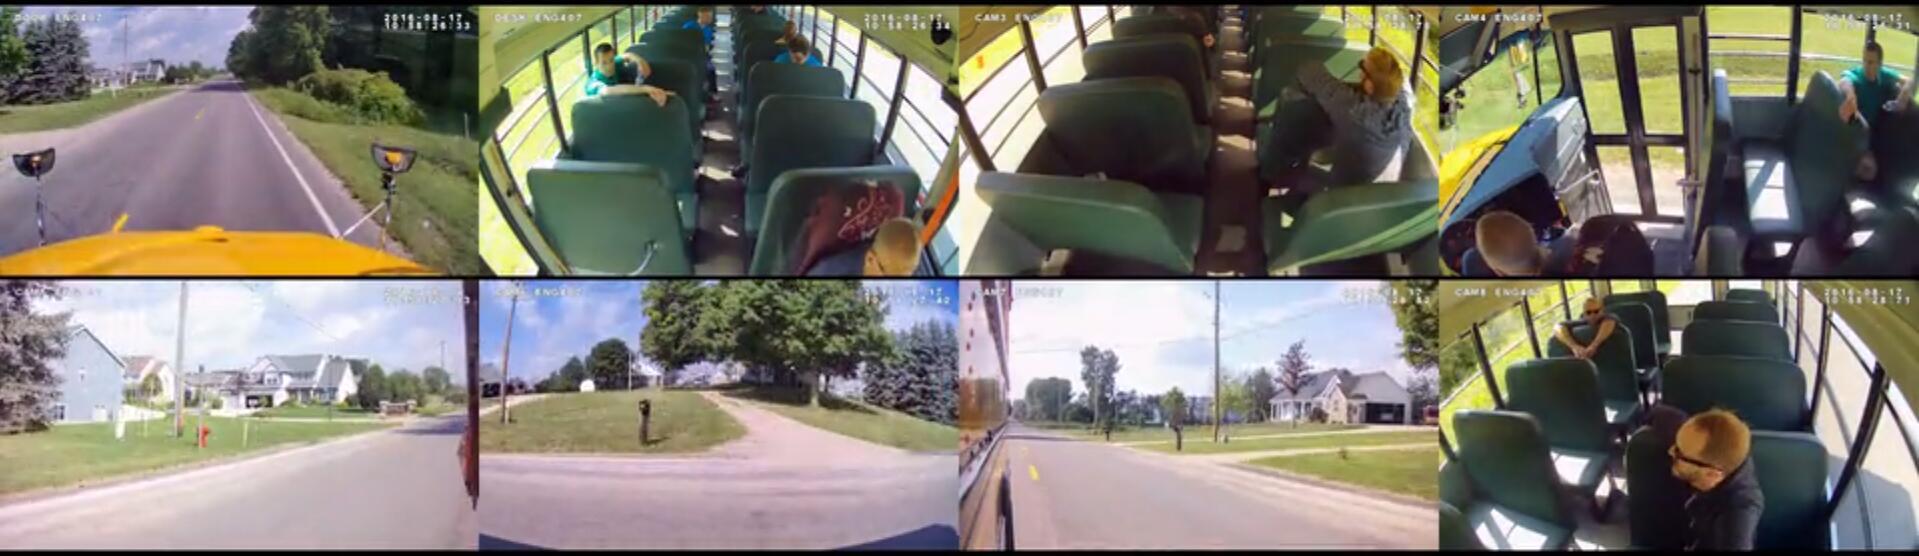 8CHs MDVR Camera system for School bus